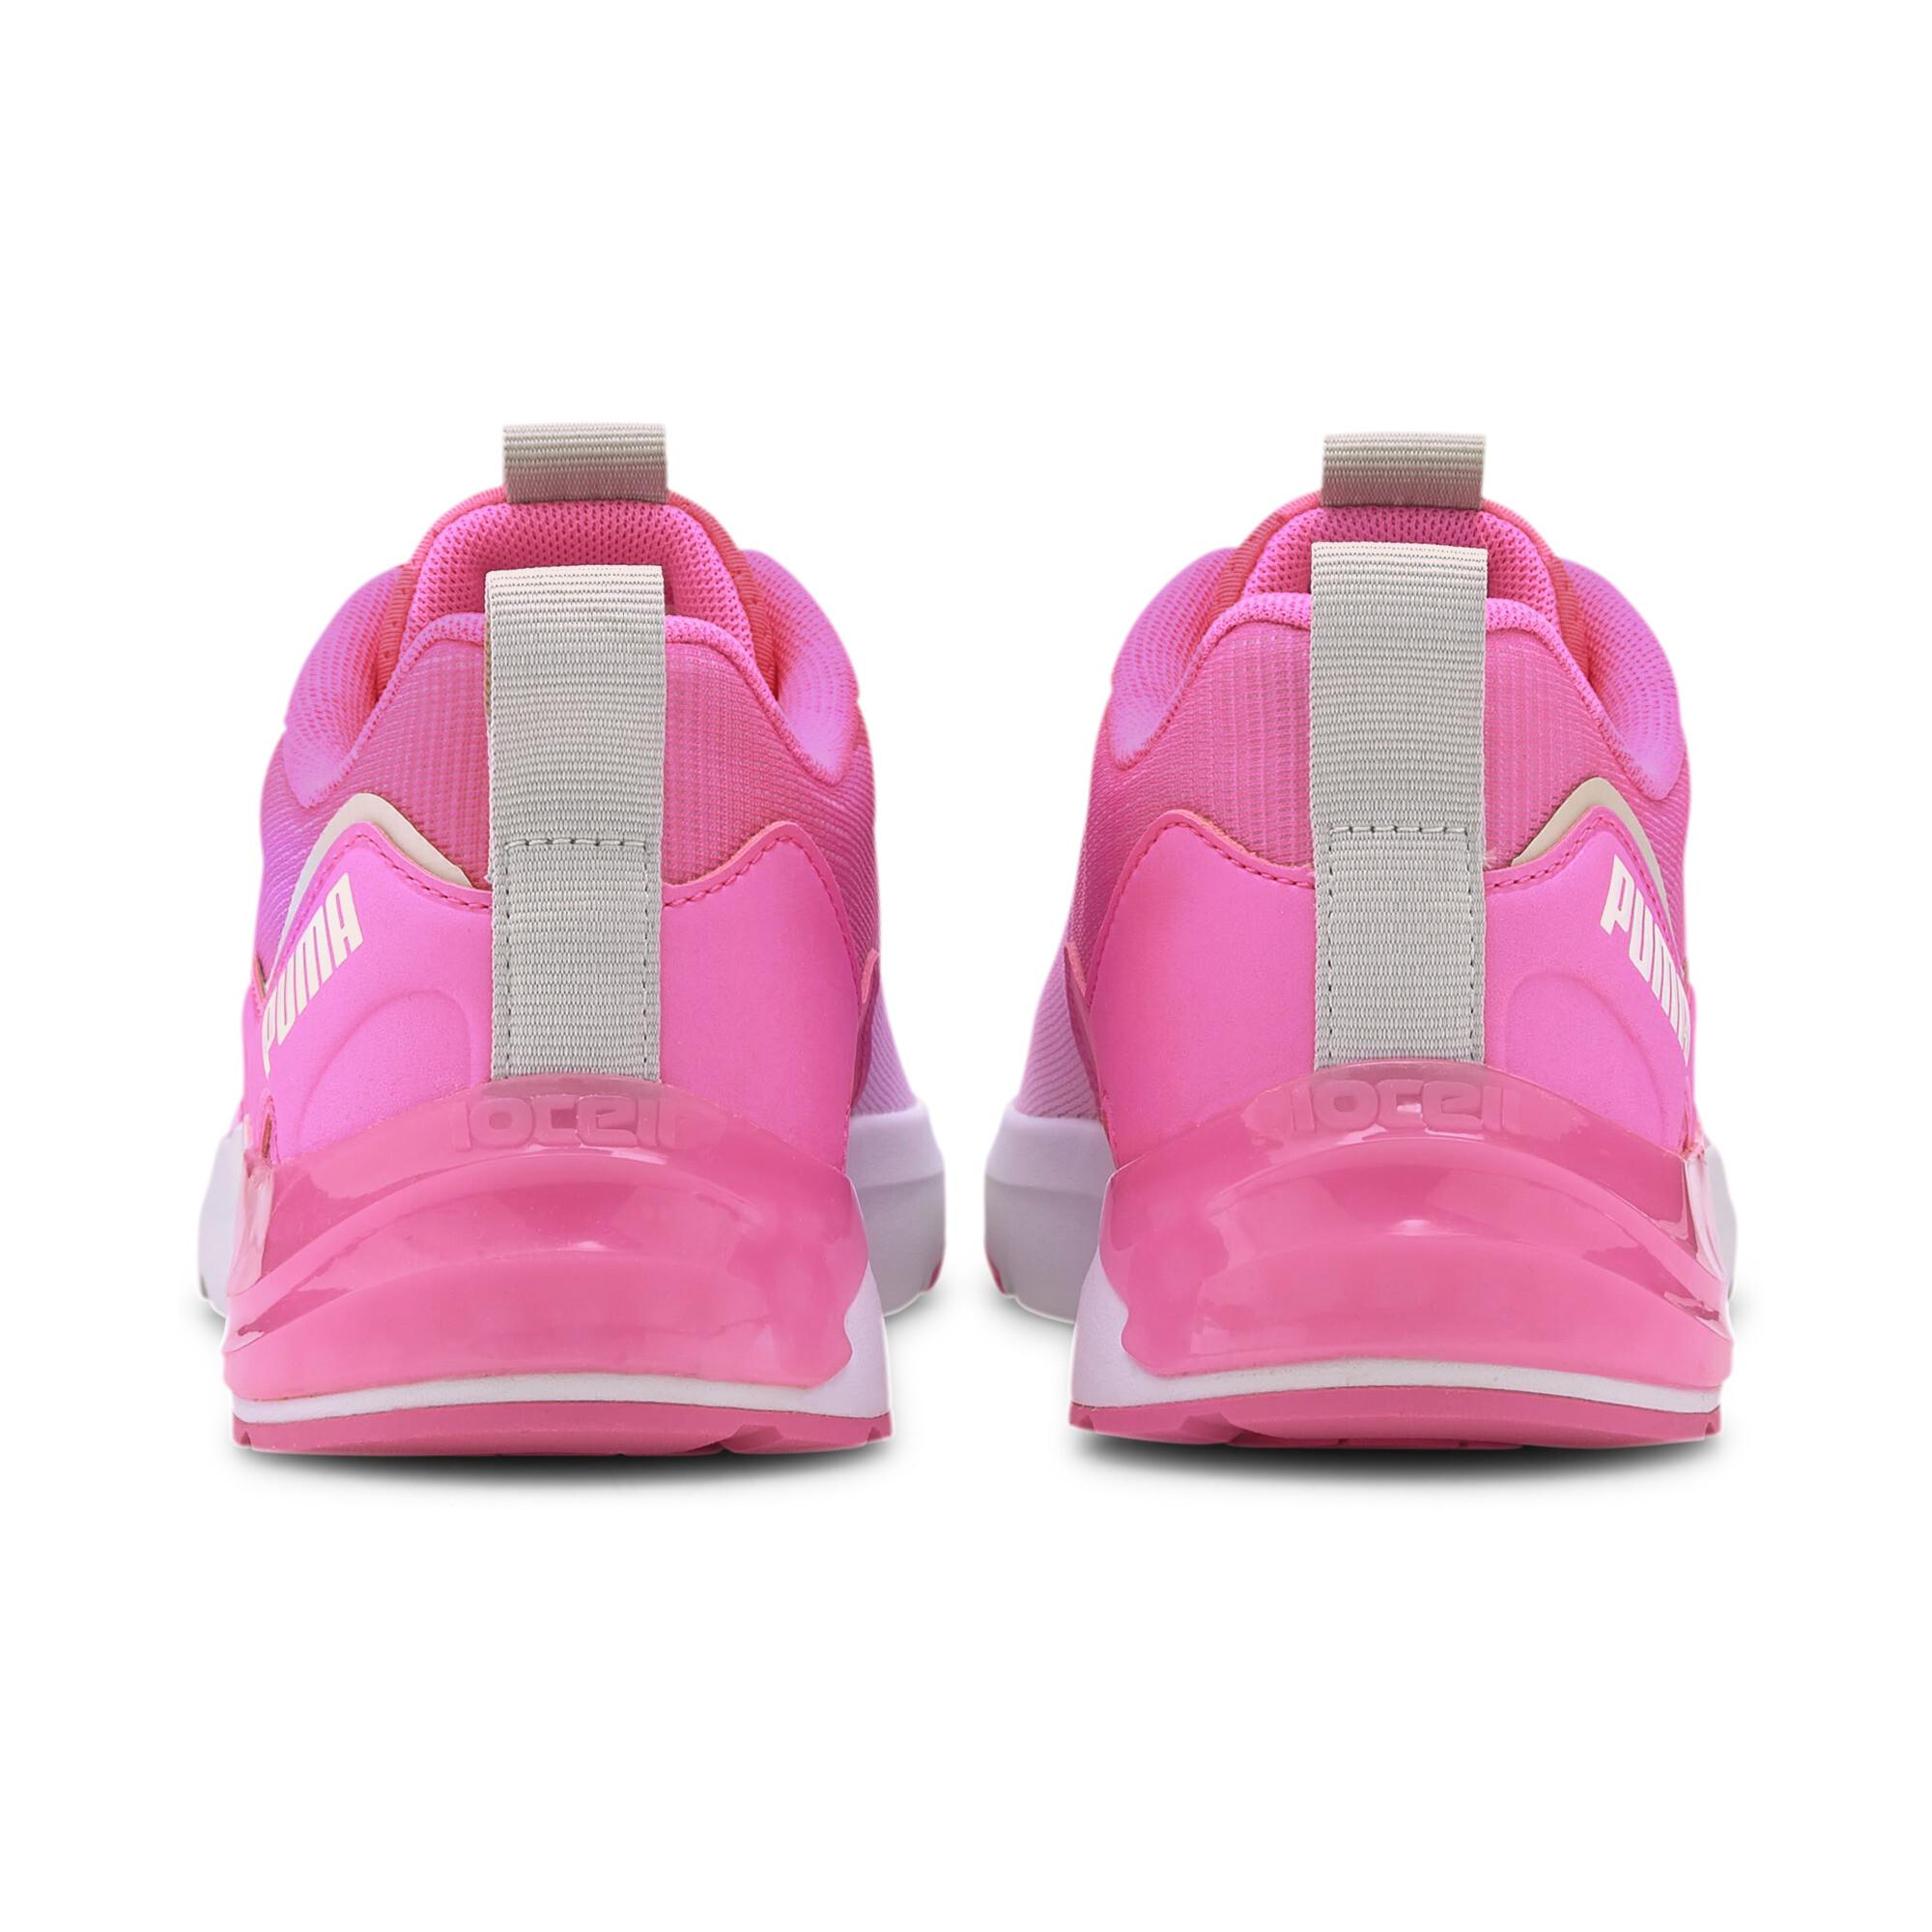 PUMA-Women-039-s-CELL-Initiate-Fade-Training-Shoes thumbnail 3